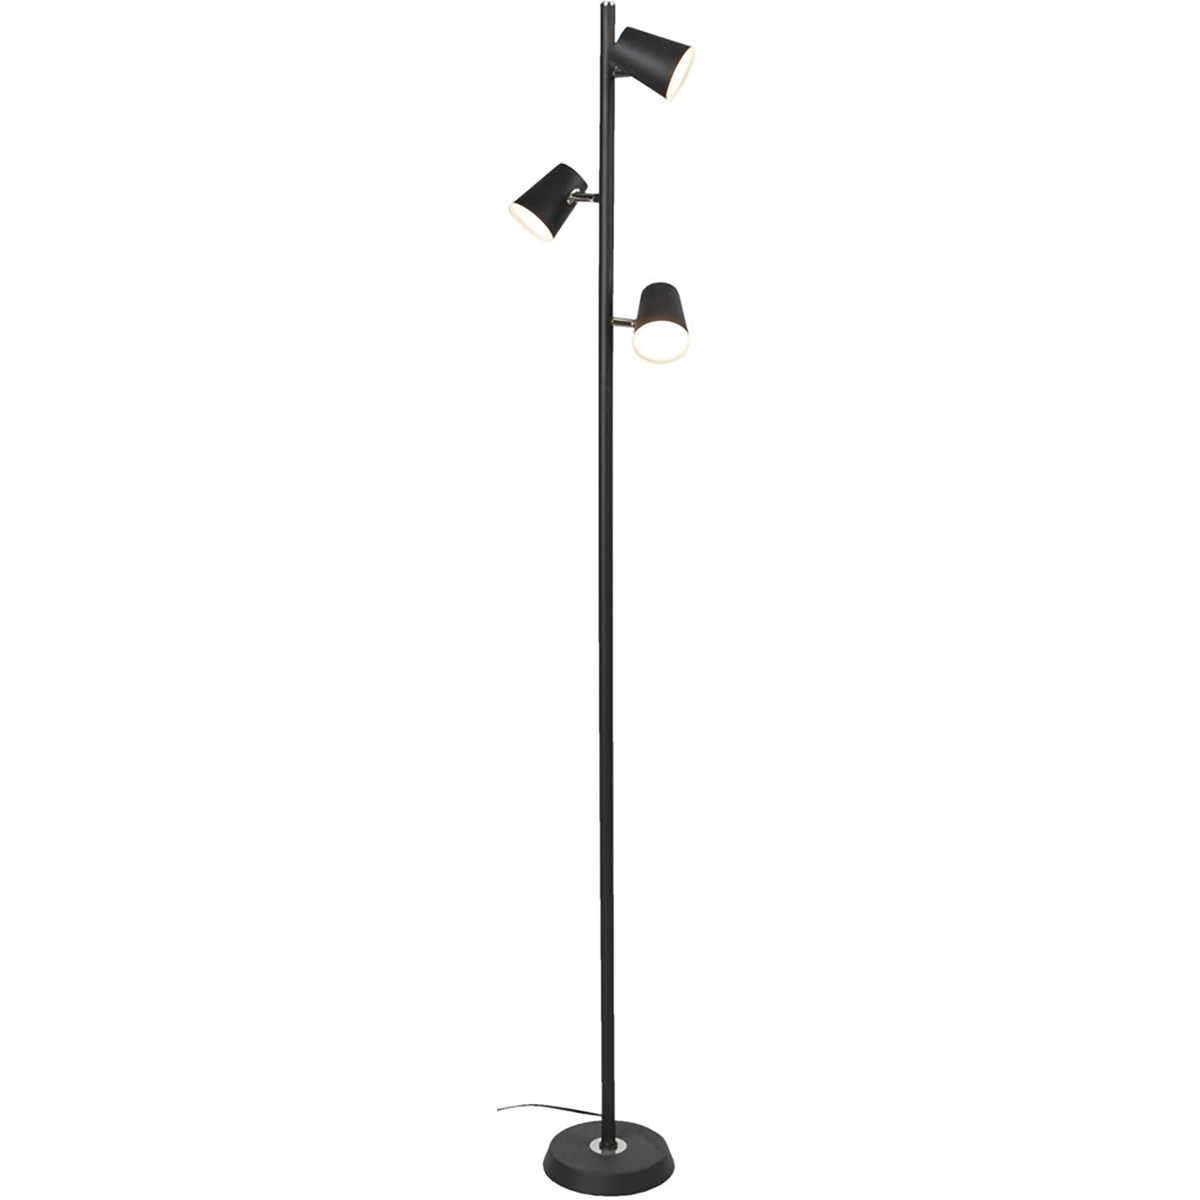 LED Vloerlamp - Trion Narca - 12W - Warm Wit 3000K - 3-lichts - Dimbaar - Rond - Mat Zwart - Alumini